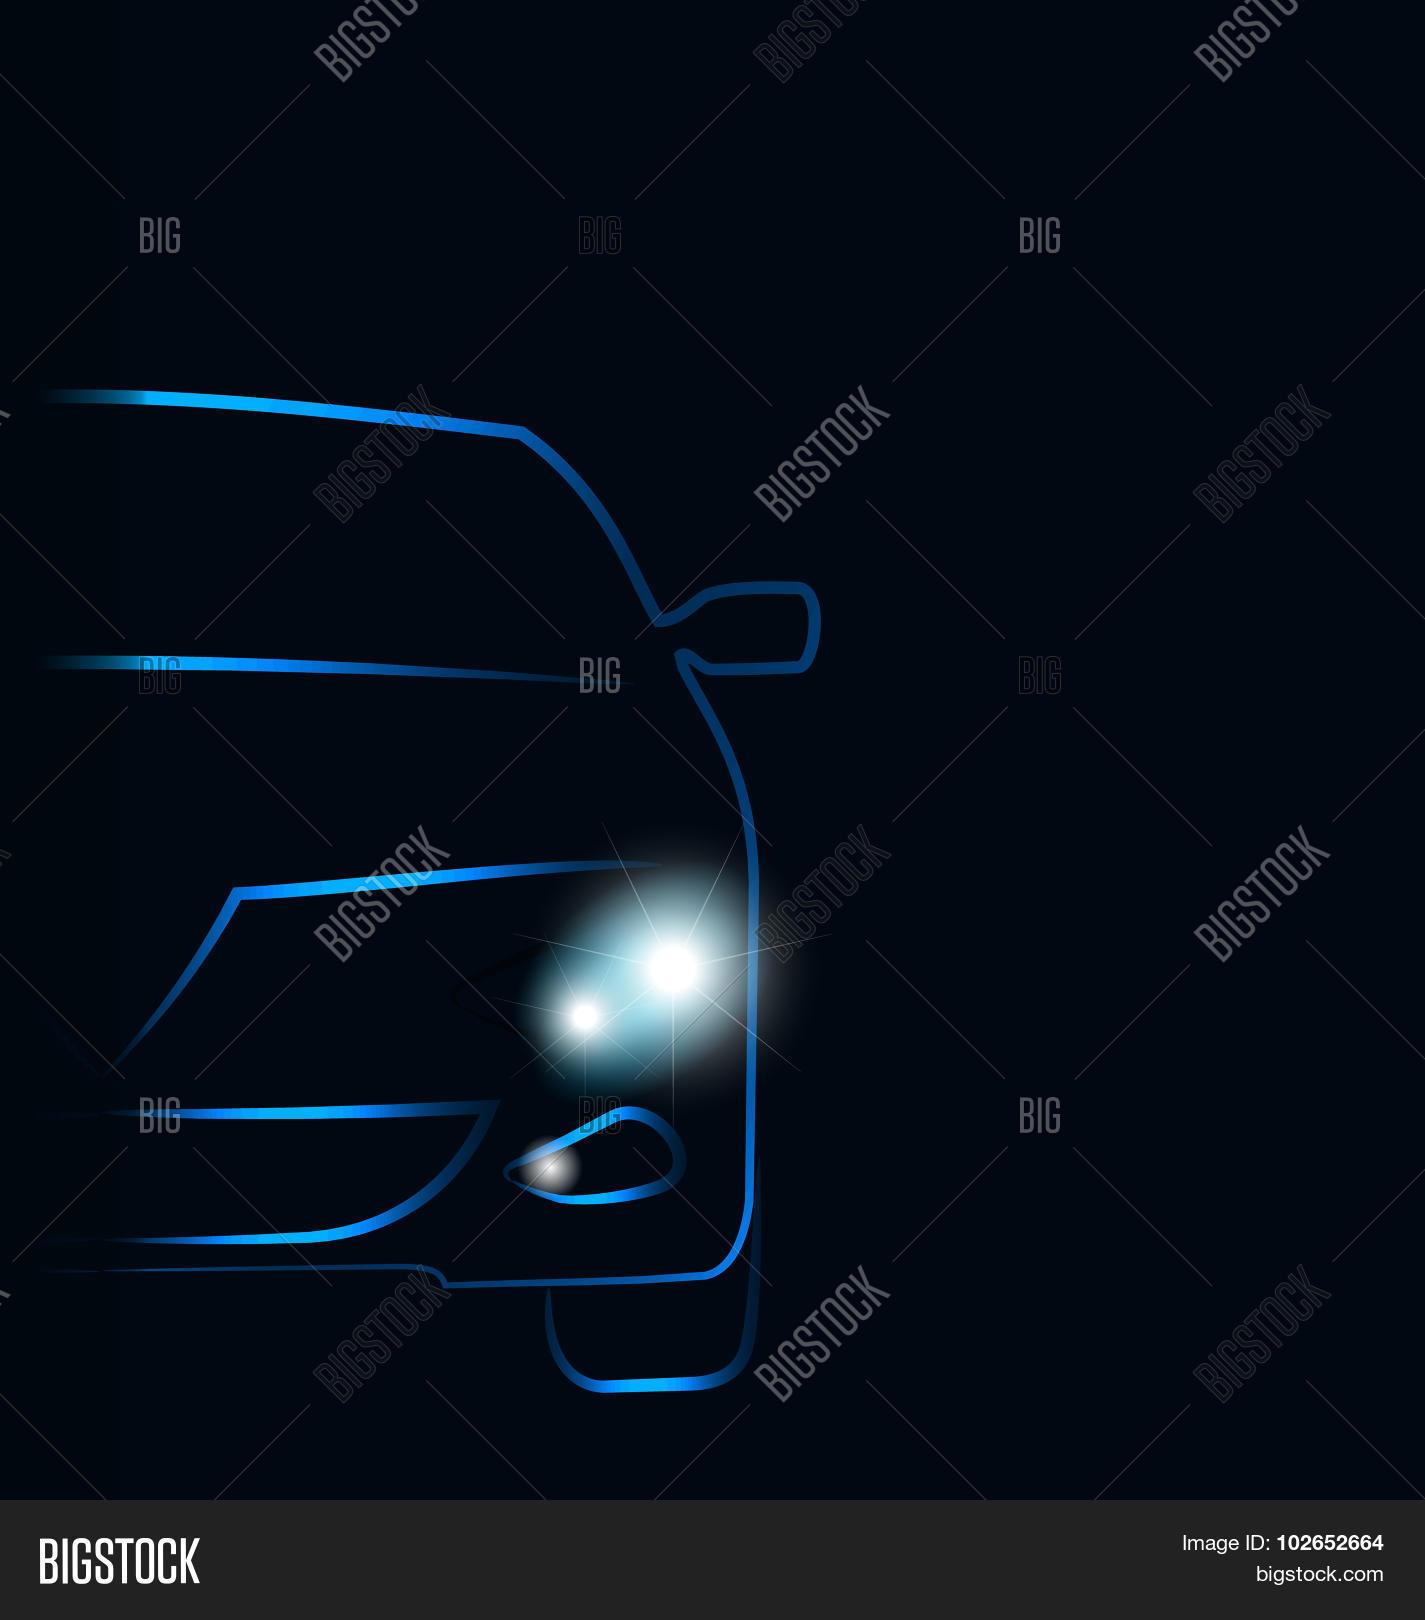 silhouette car vector photo free trial bigstock silhouette car vector photo free